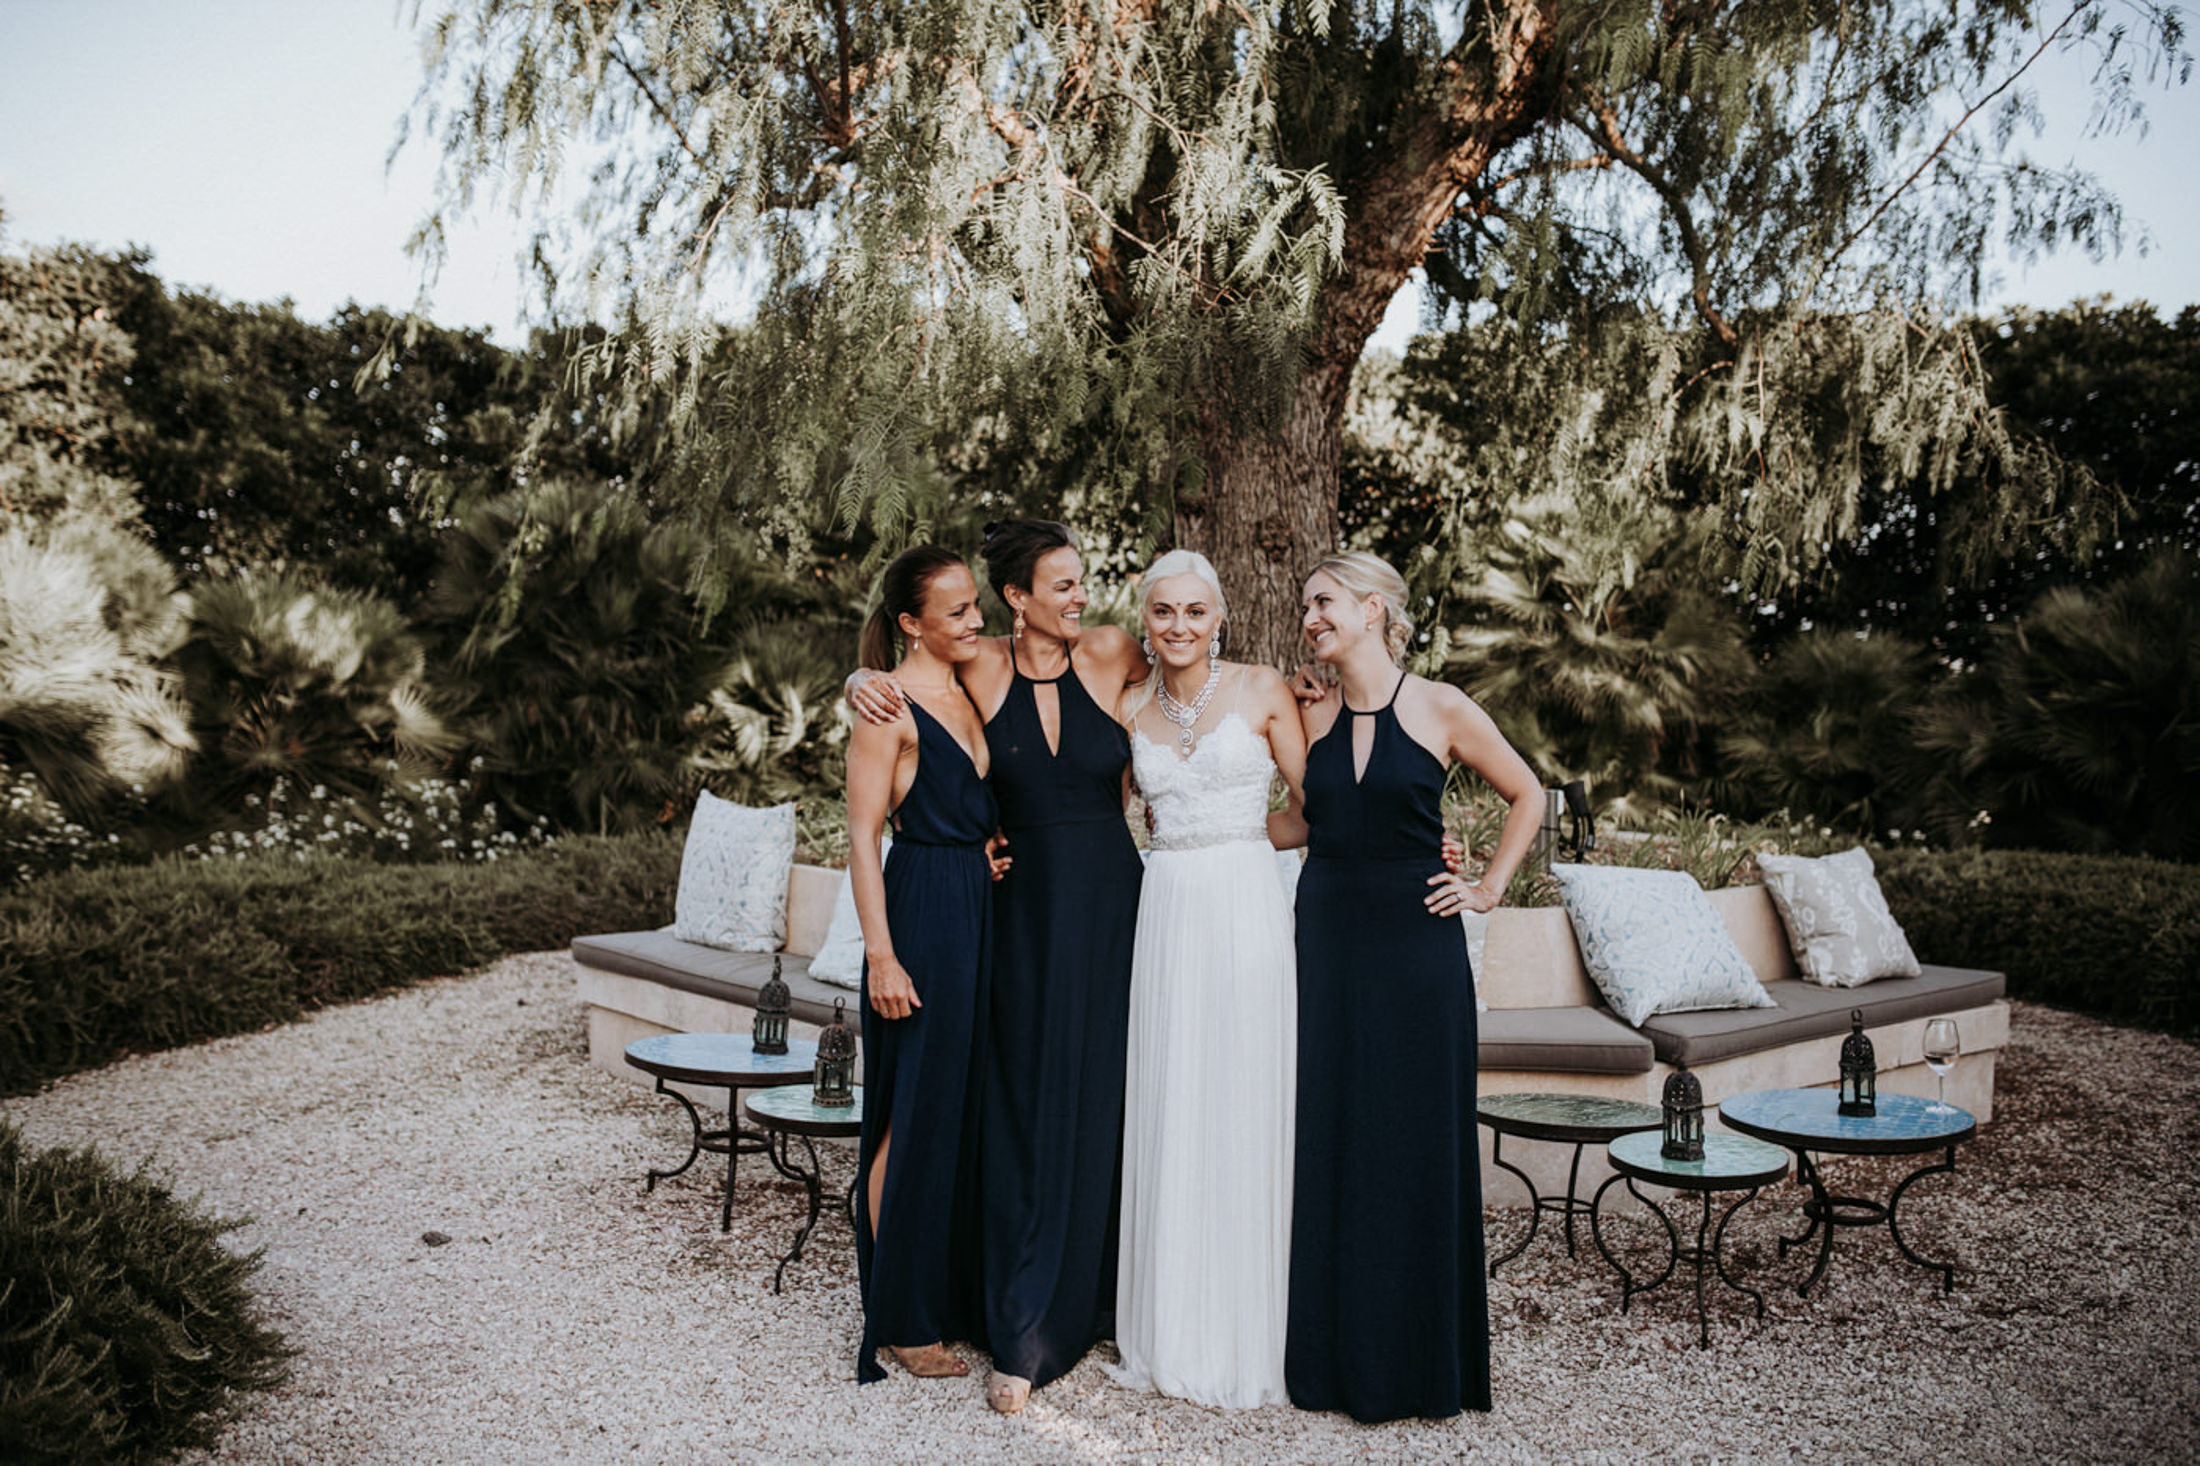 Wedding_Photographer_Mallorca_Daniela-Marquardt_Photography_New_York_Iceland_Tuscany_Santorini_Portugal_Austria_Bavaria_Elopement_Hochzeitsfotograf_AntjeRajat2_106